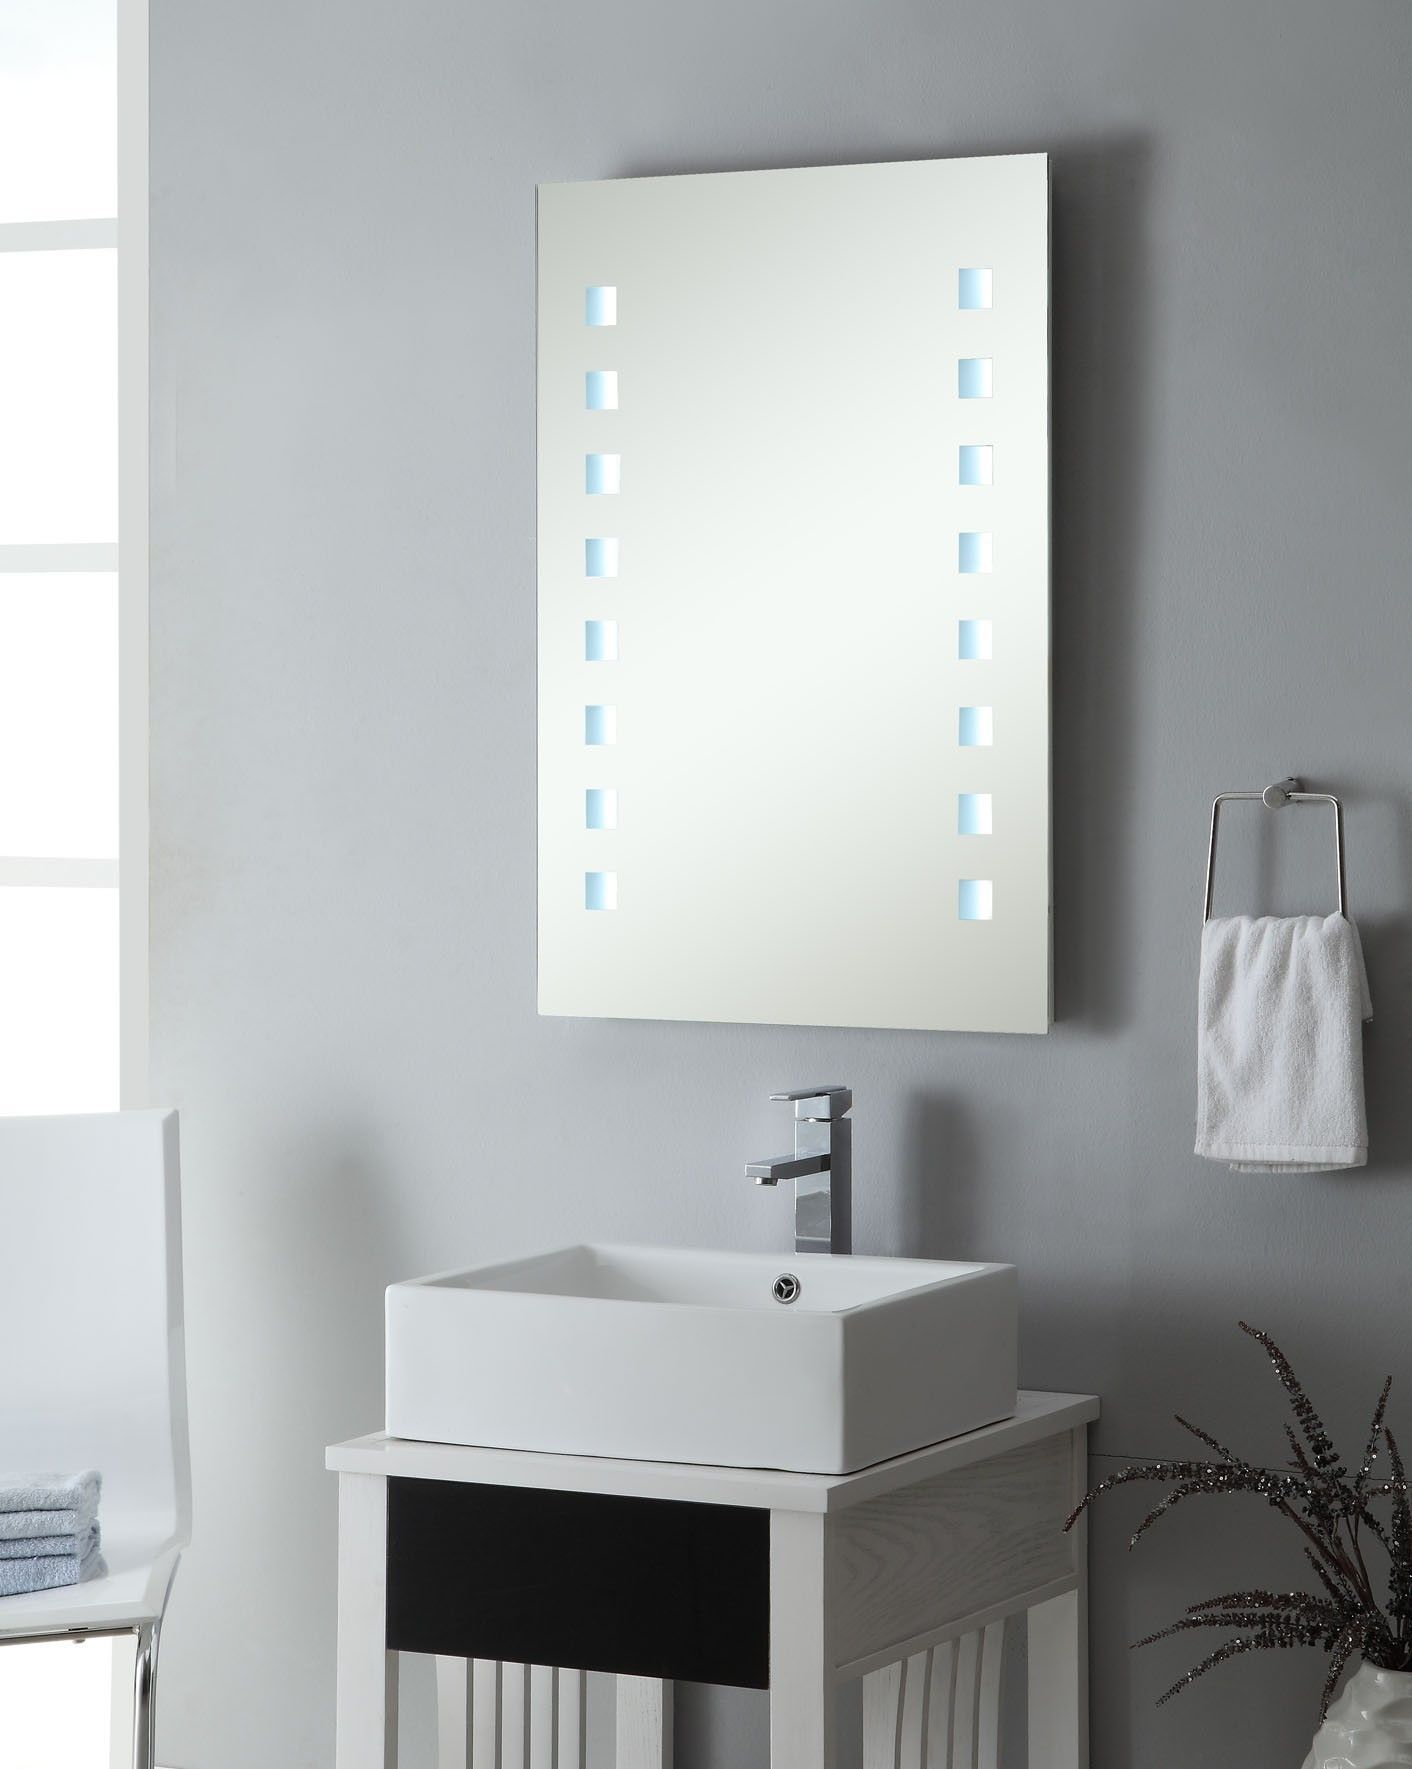 Moderne Badezimmer Spiegel Modernes Badezimmer Badezimmer Dekor Moderne Badezimmerspiegel